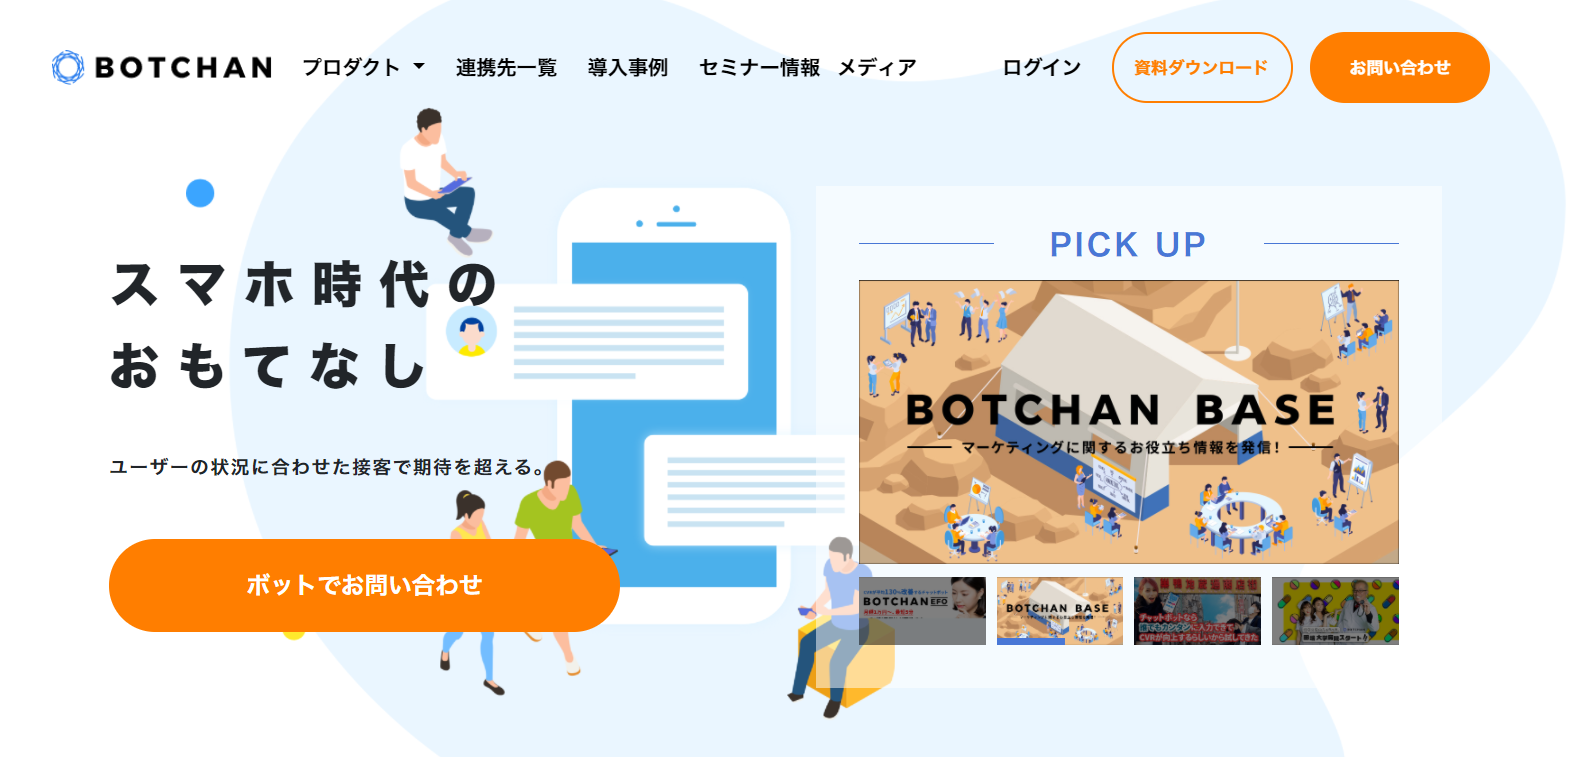 BOTCHANの画像